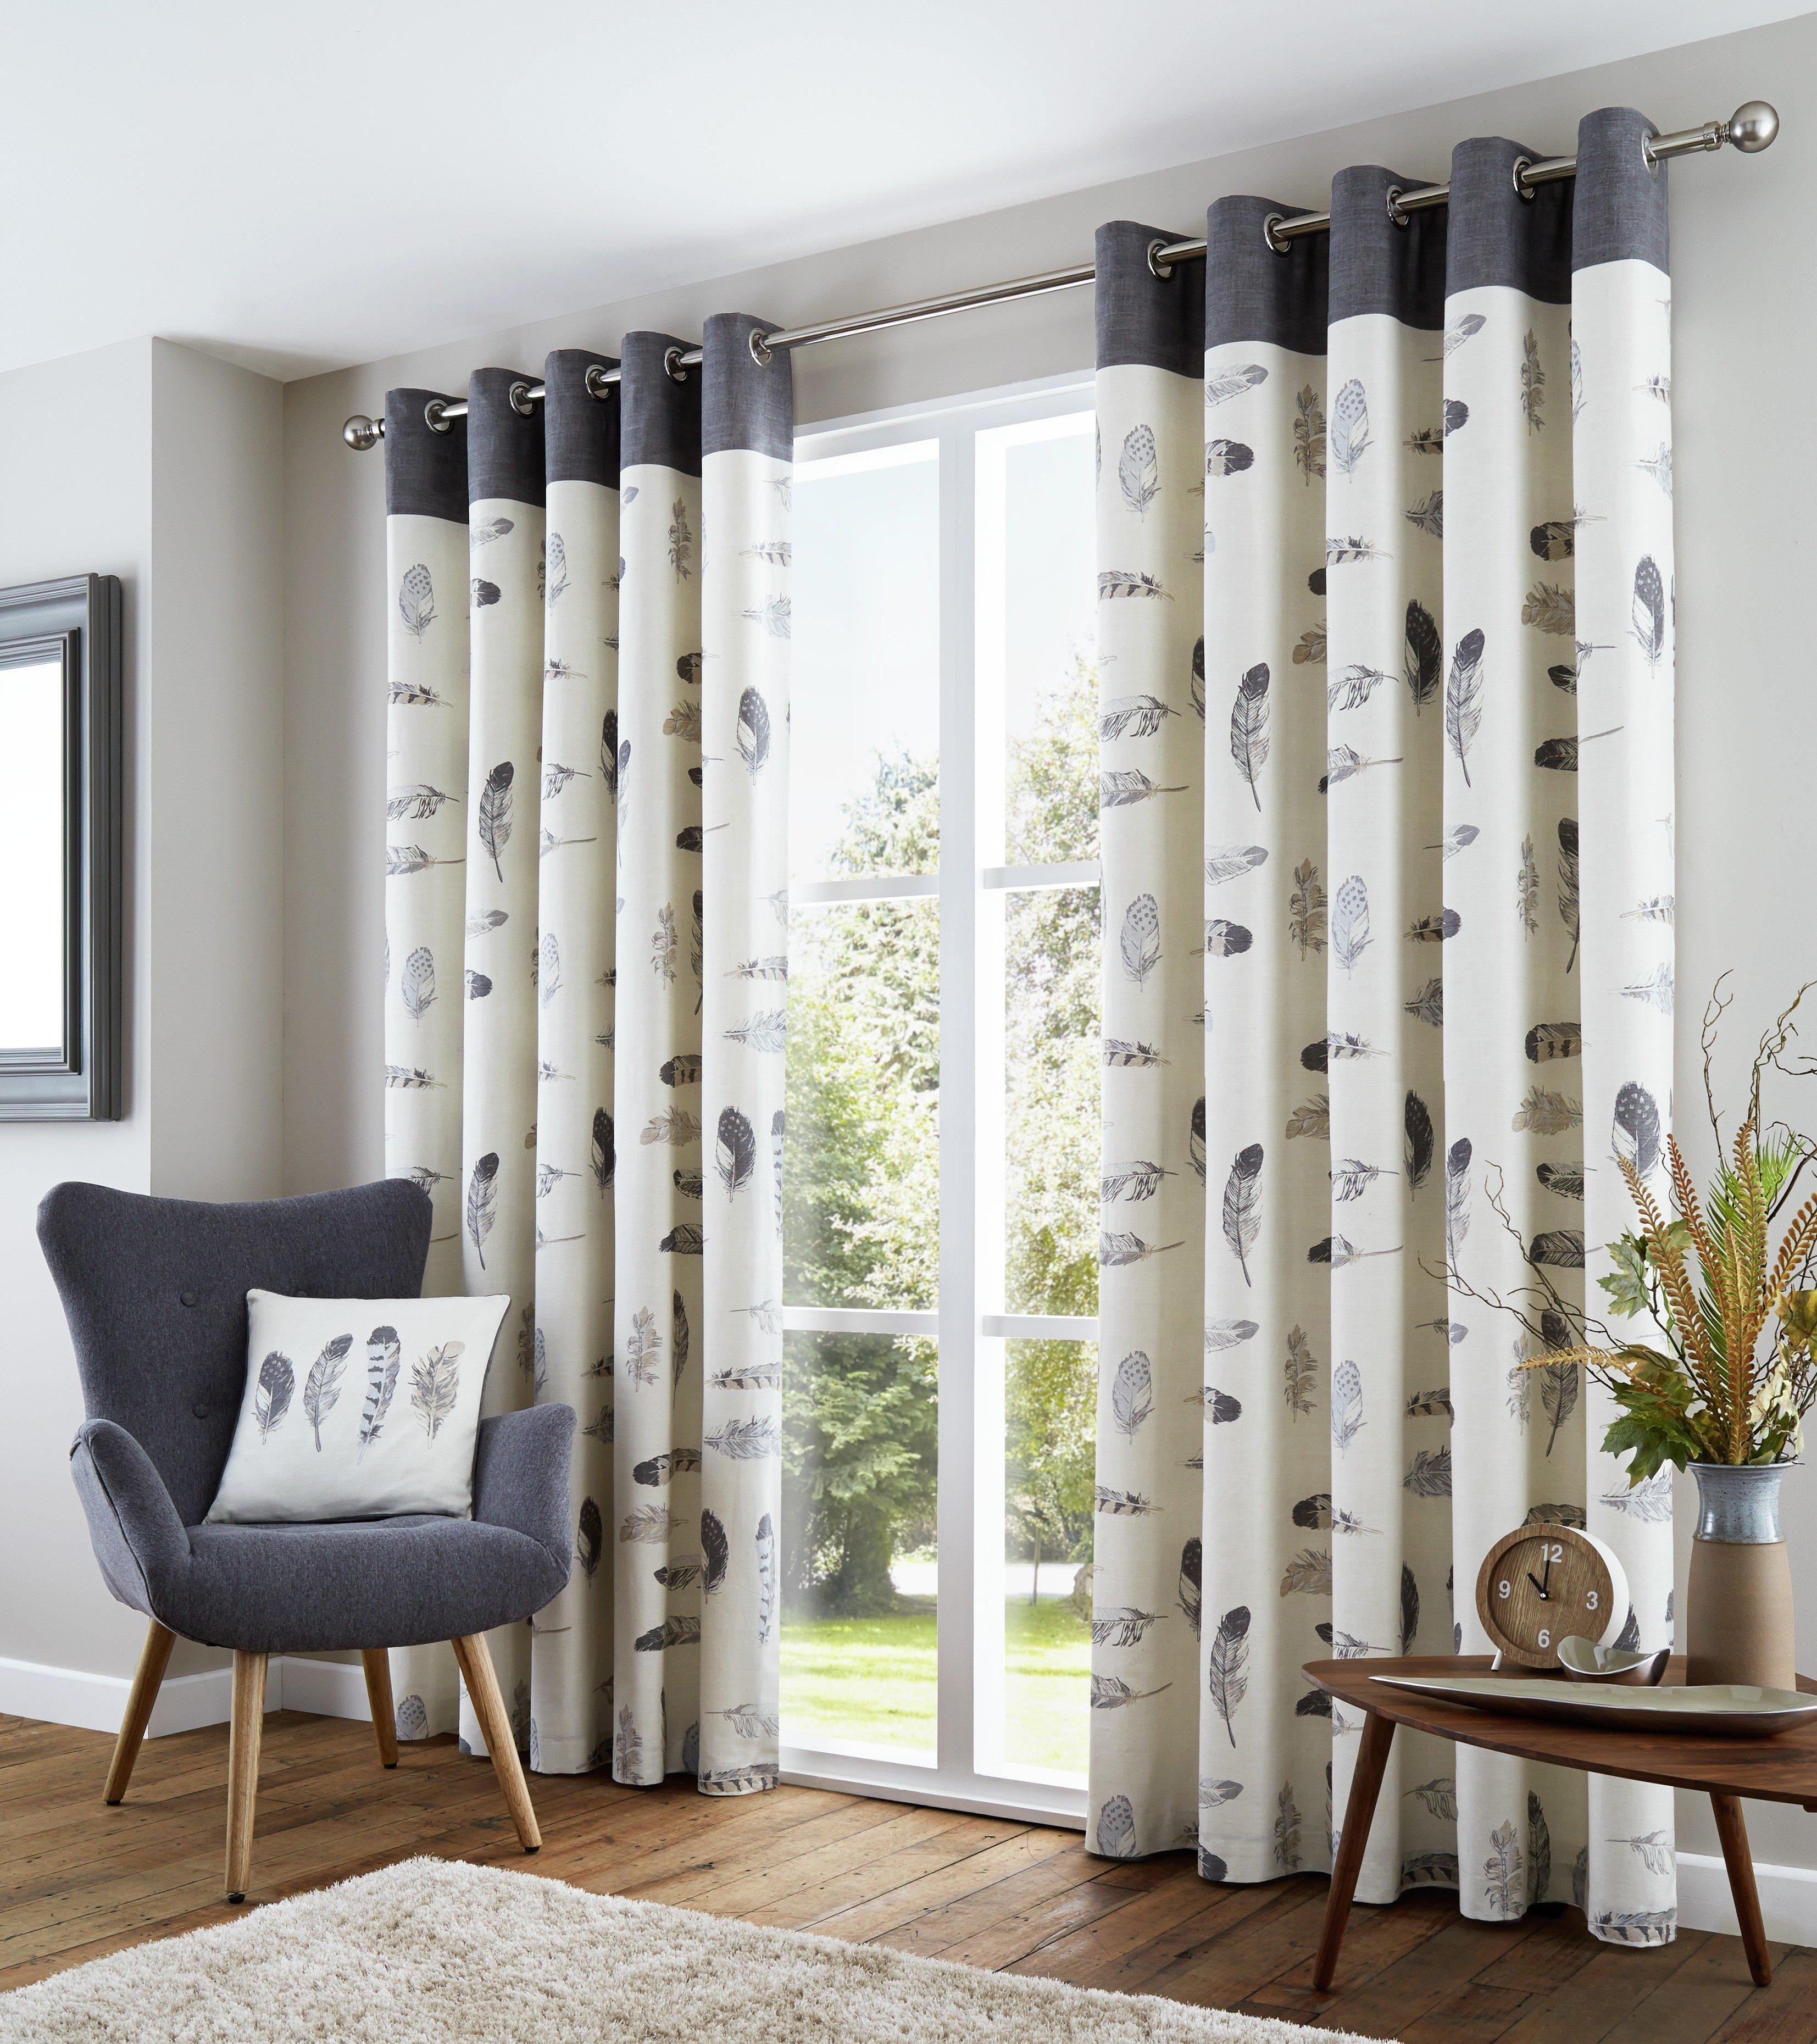 fusion-idaho-eyelet-curtains-117x183cm-charcoal